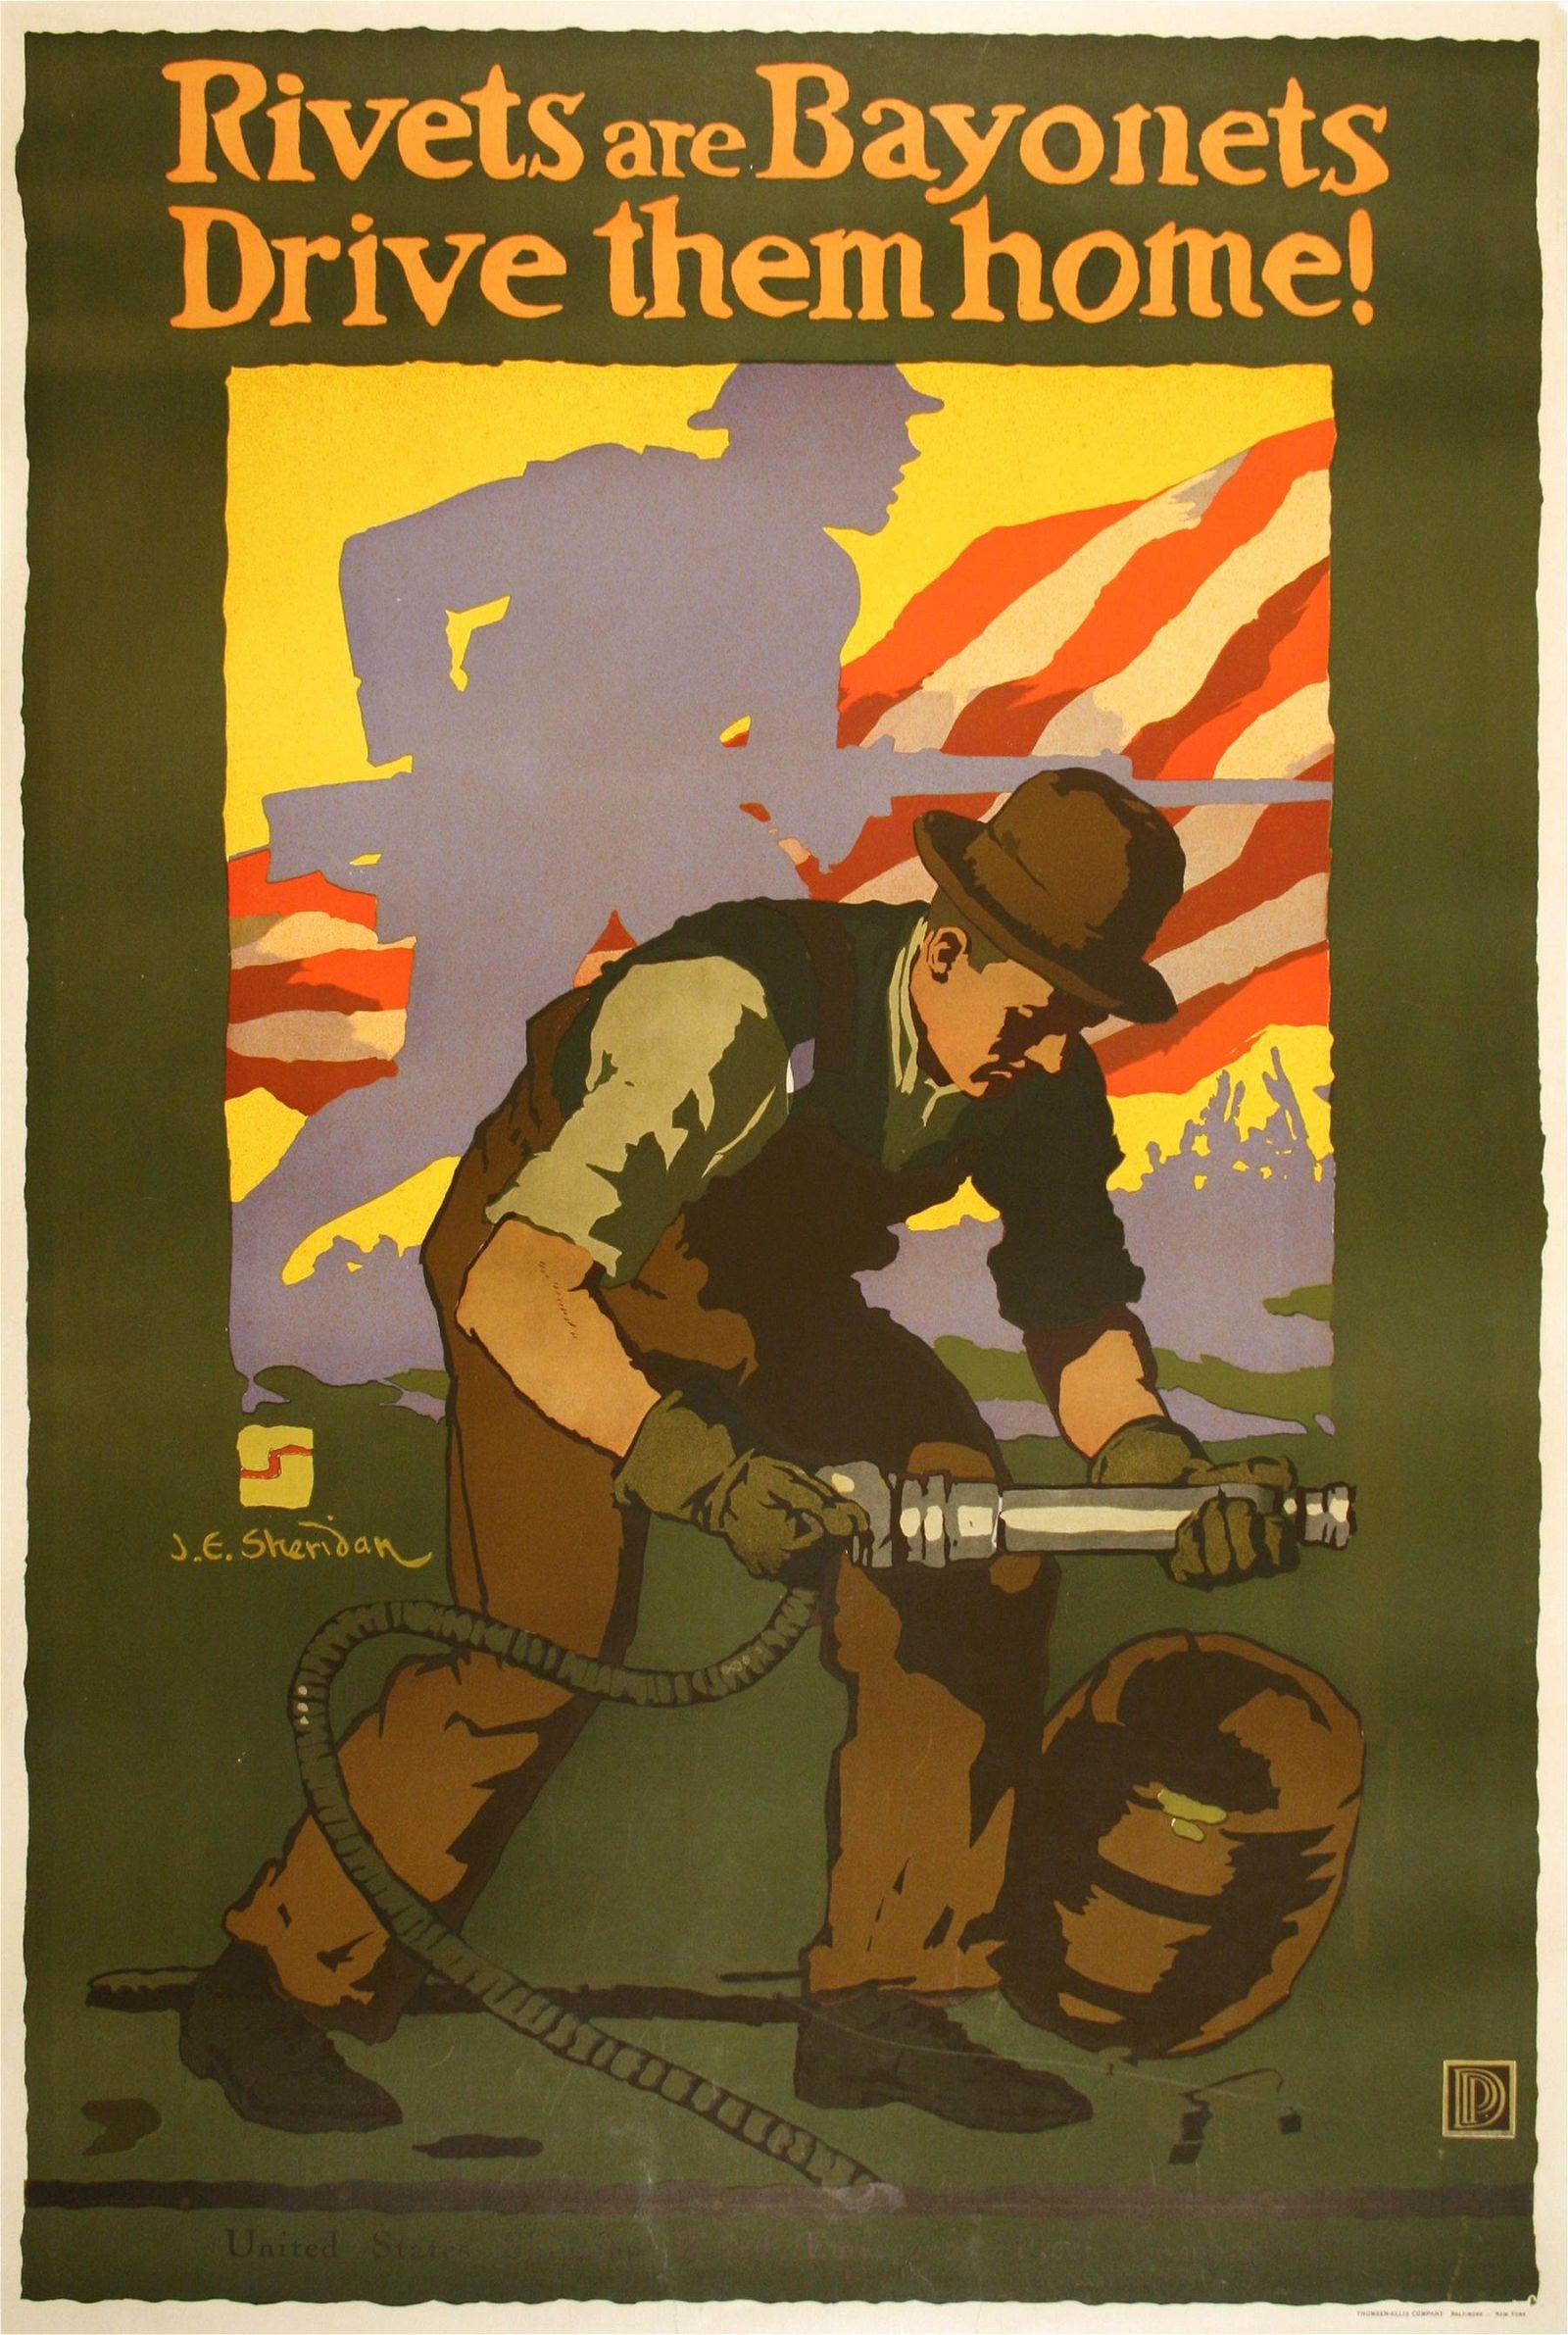 Rivets are Bayonets - Drive Them Home Original Vintage